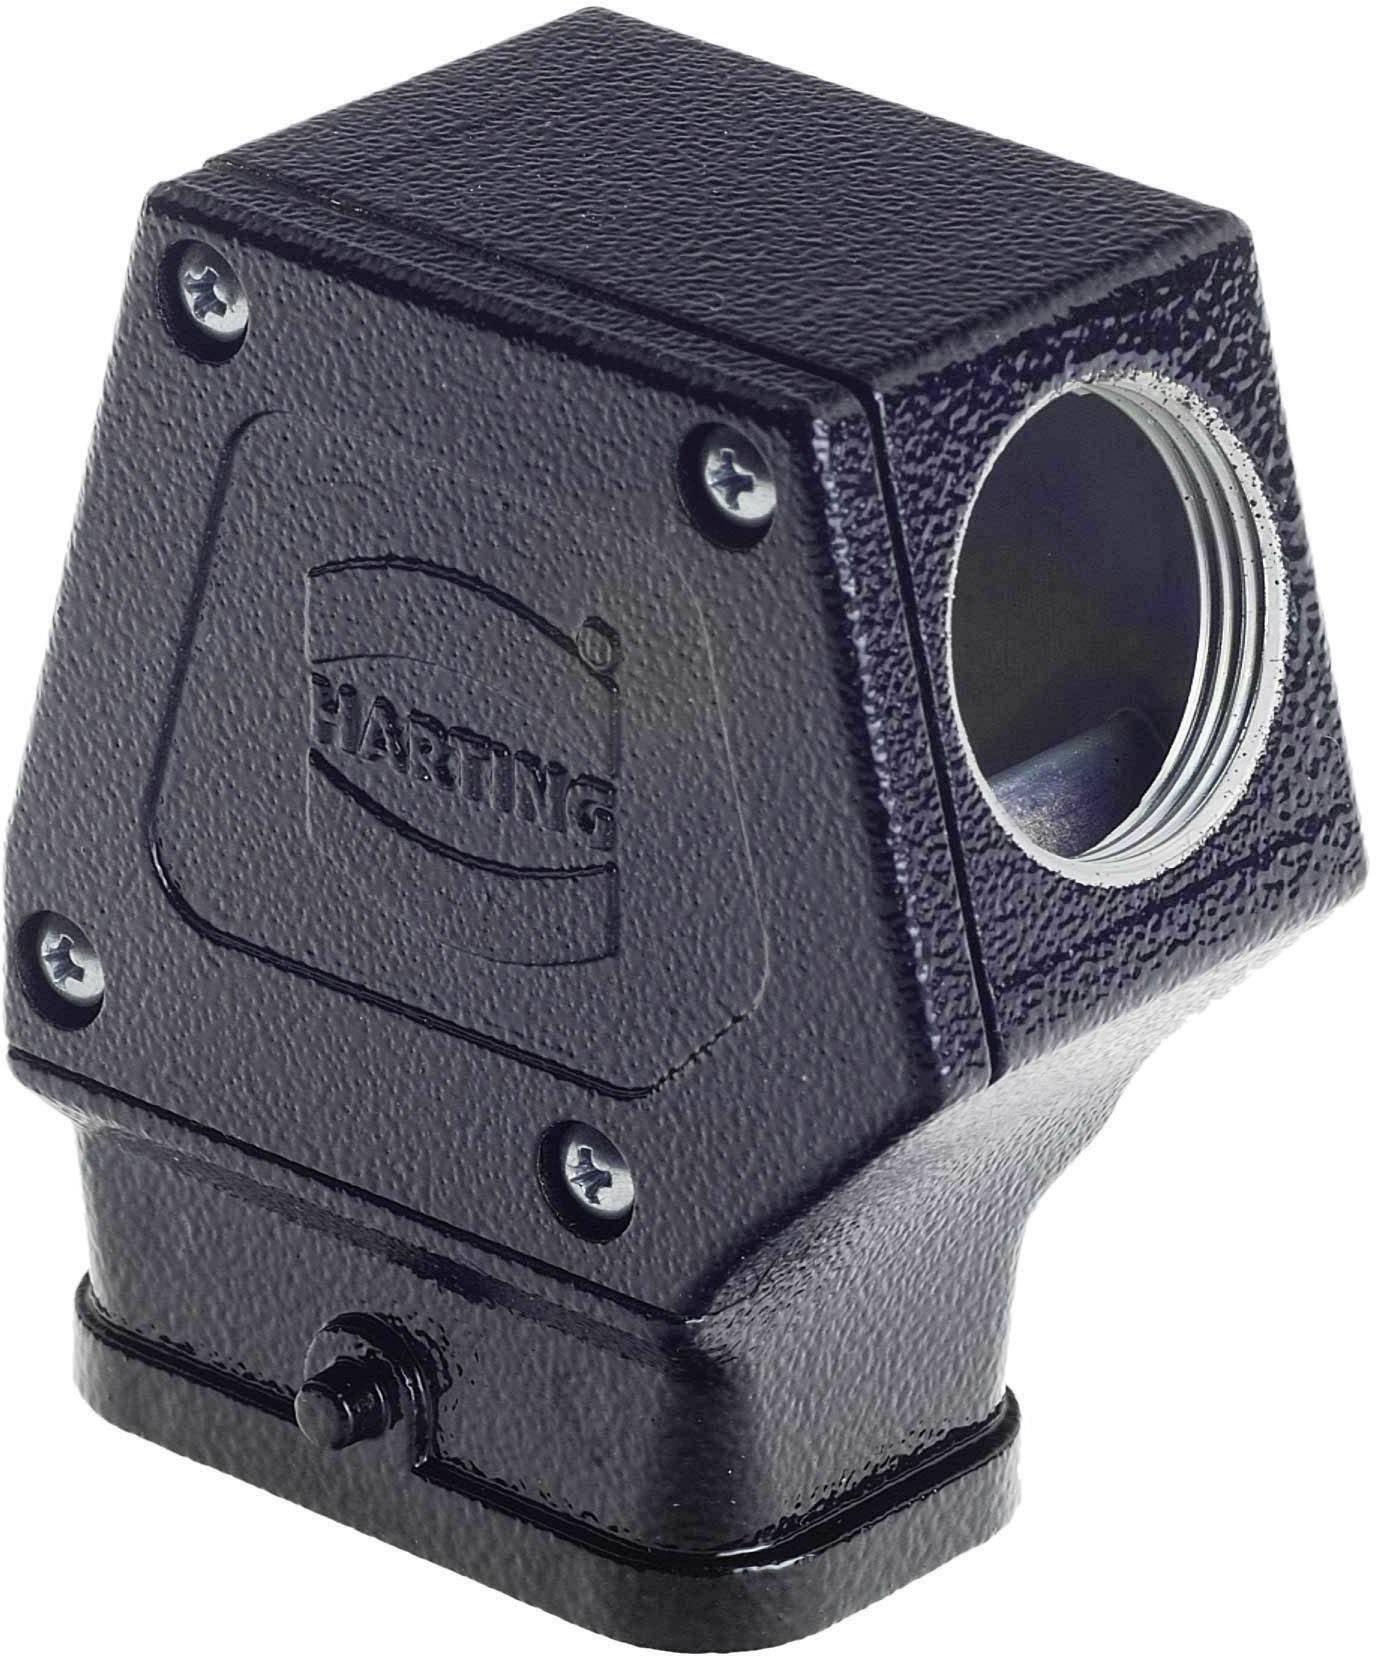 Púzdro Harting Han Compact-gs-M25 19 12 008 0526, 1 ks